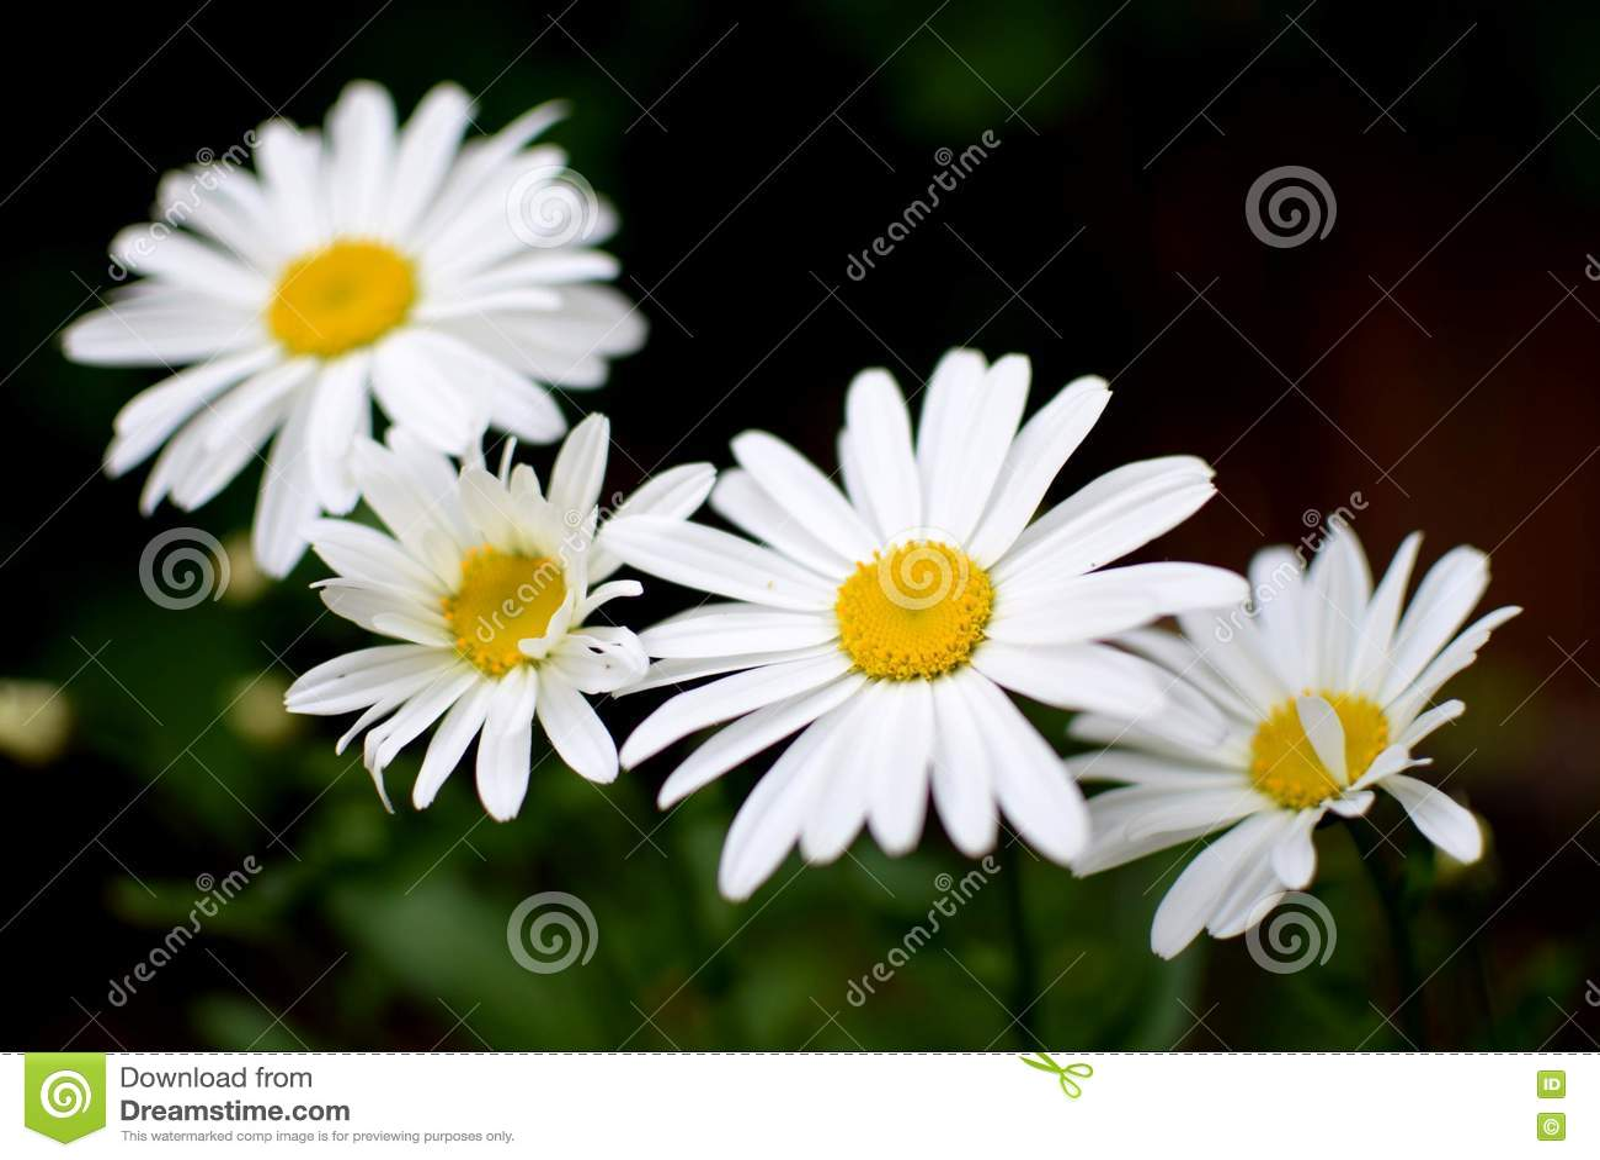 Quatro Daisy Flowers